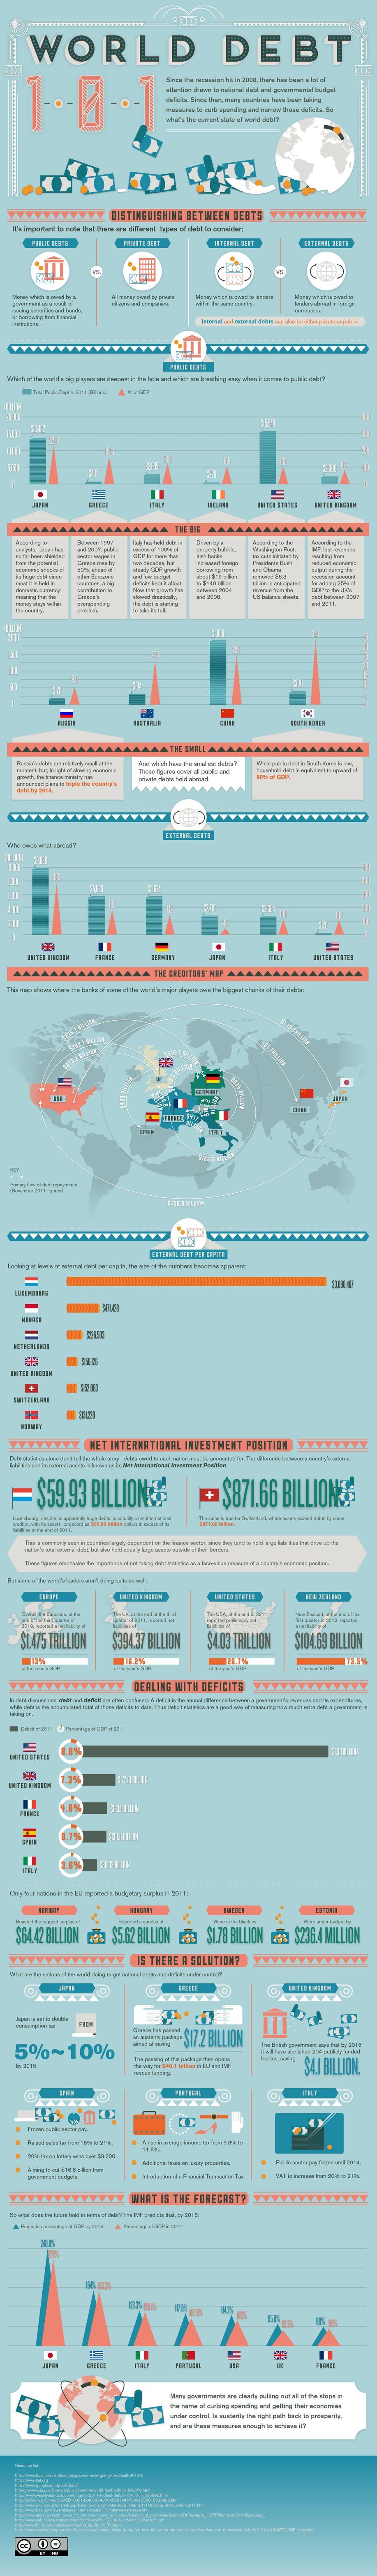 world_debt_infographic